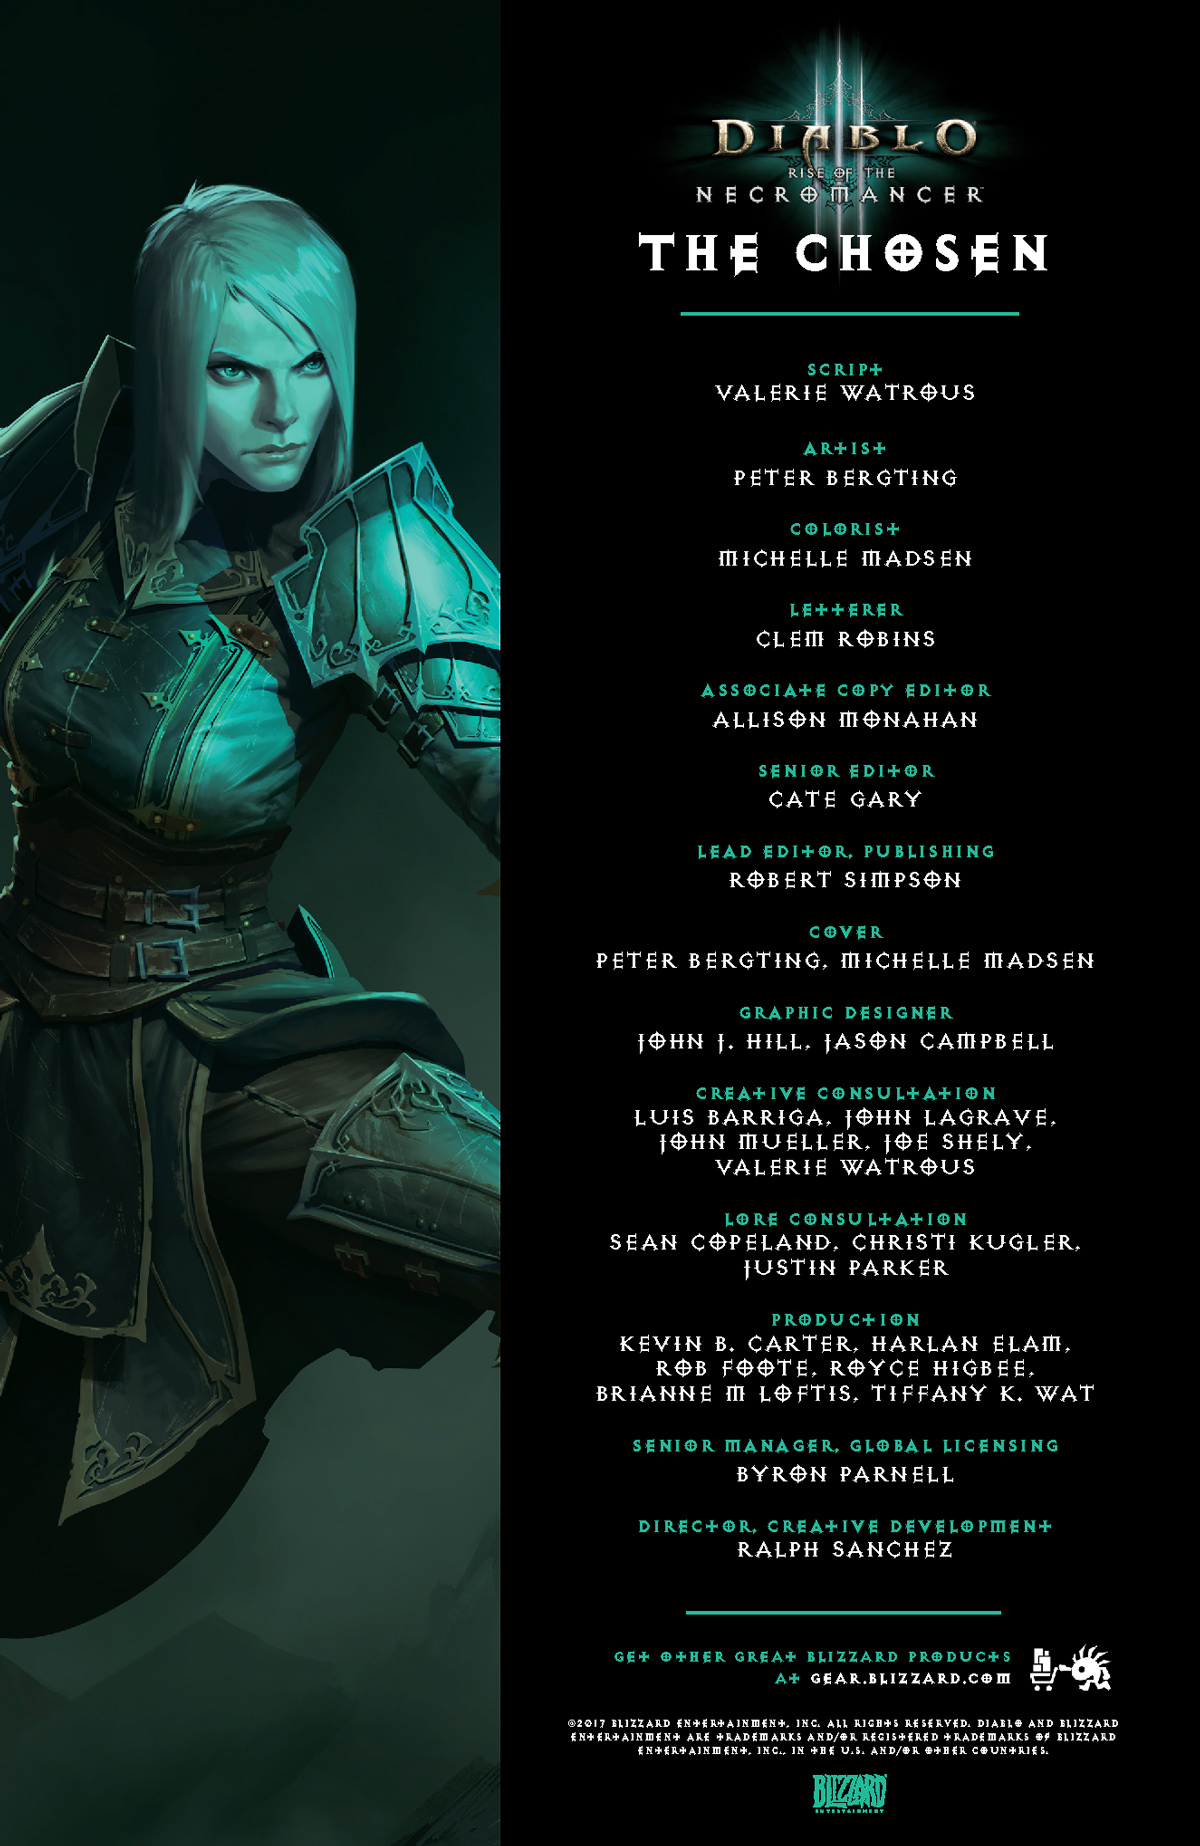 The Chosen - Diablo III